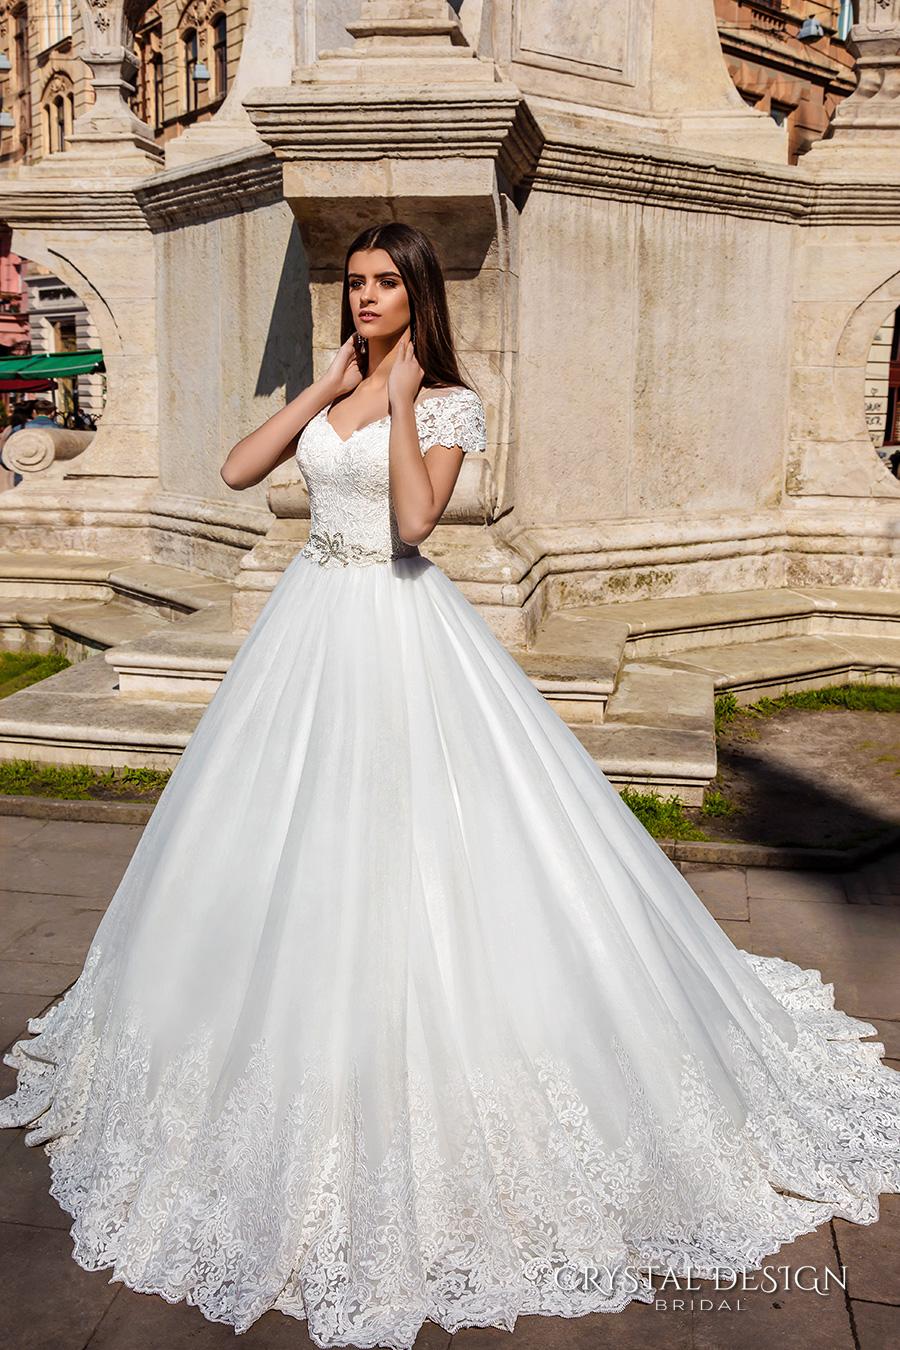 sheath wedding dresses lace back sheer back wedding dress Allure Allure Romance Lace Sheer Back Wedding Dress